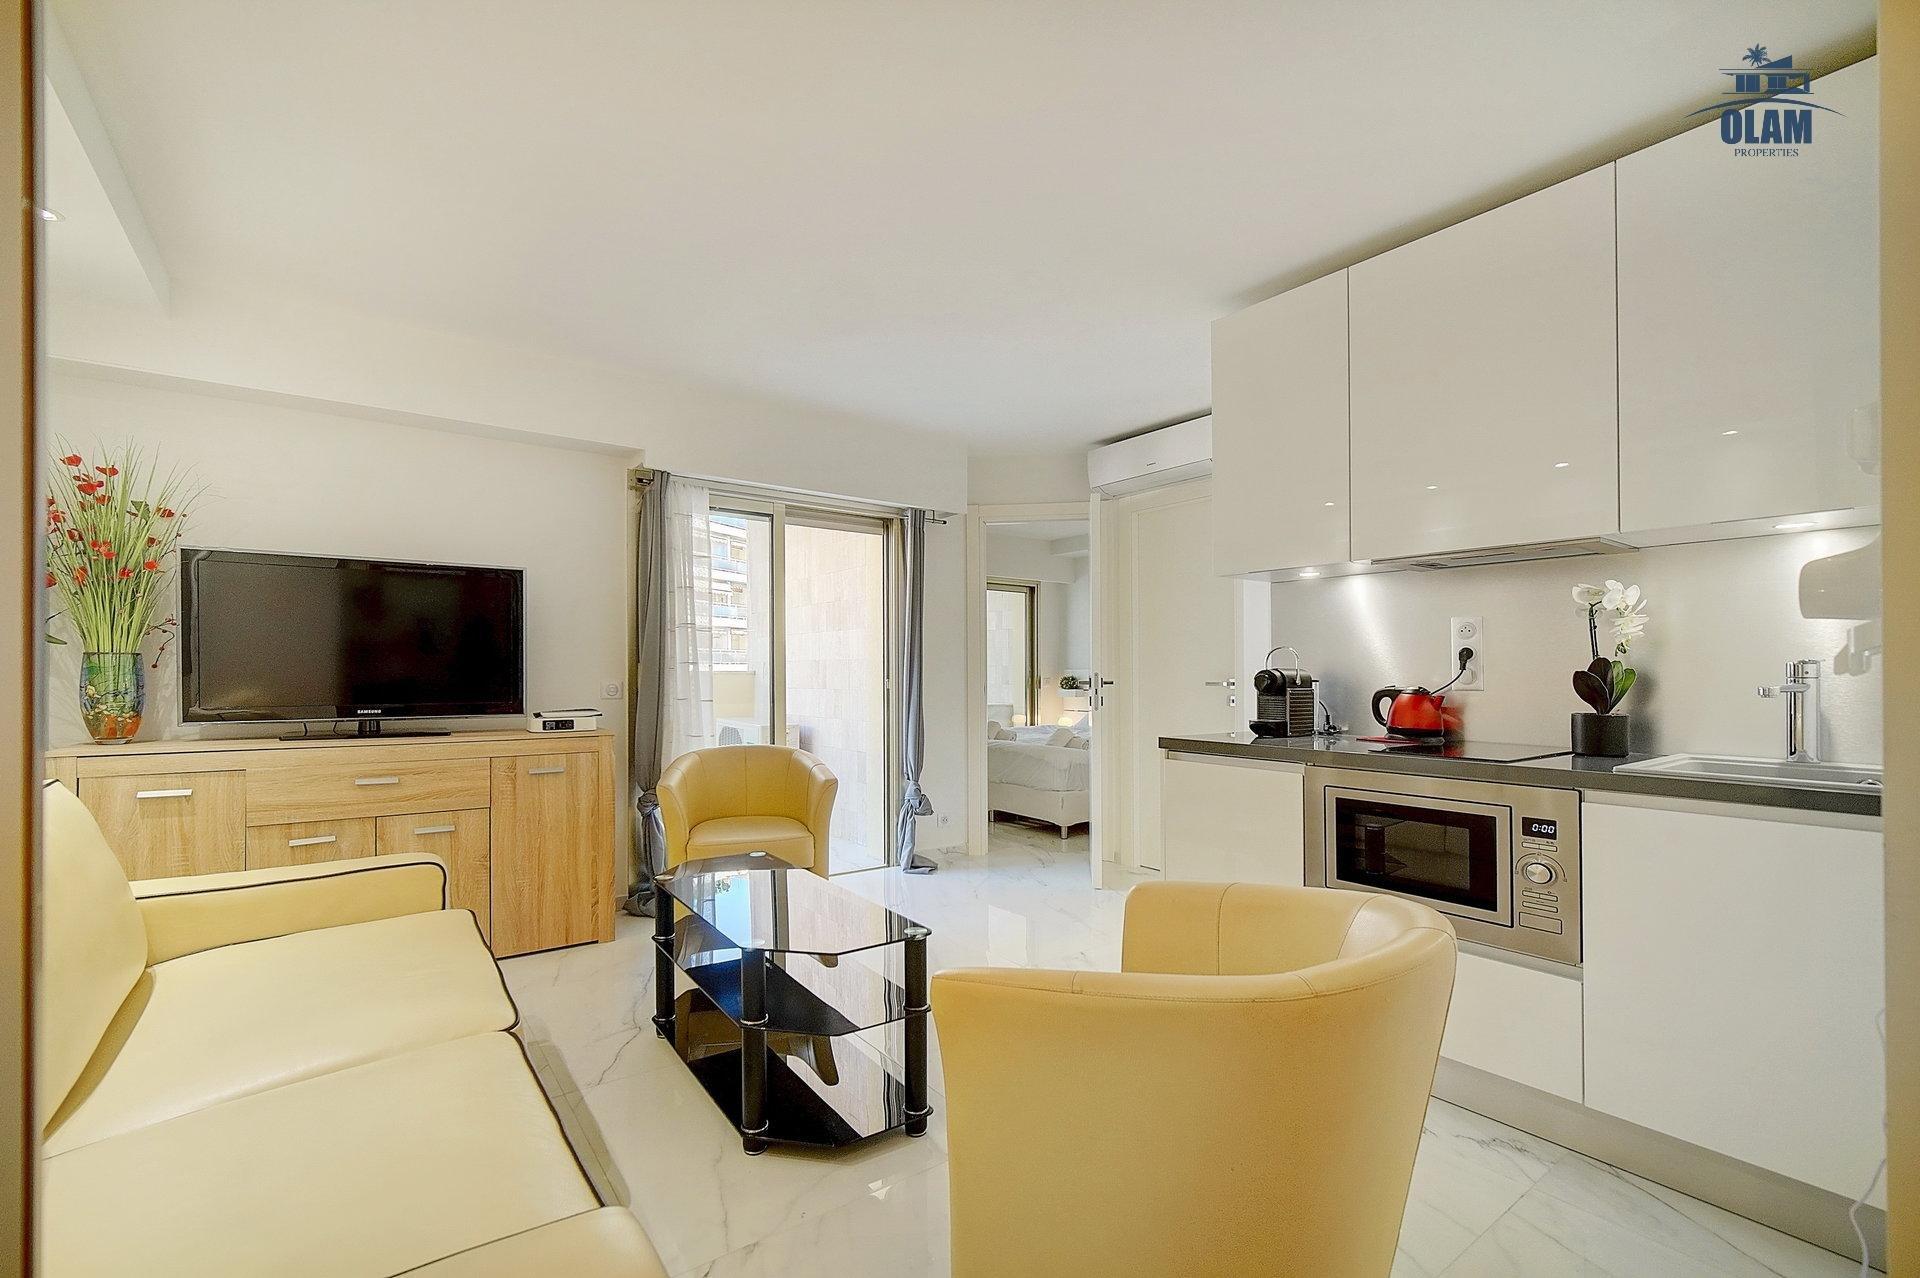 Living room, Cannes, Croisette, French Riviera, seasonal rental